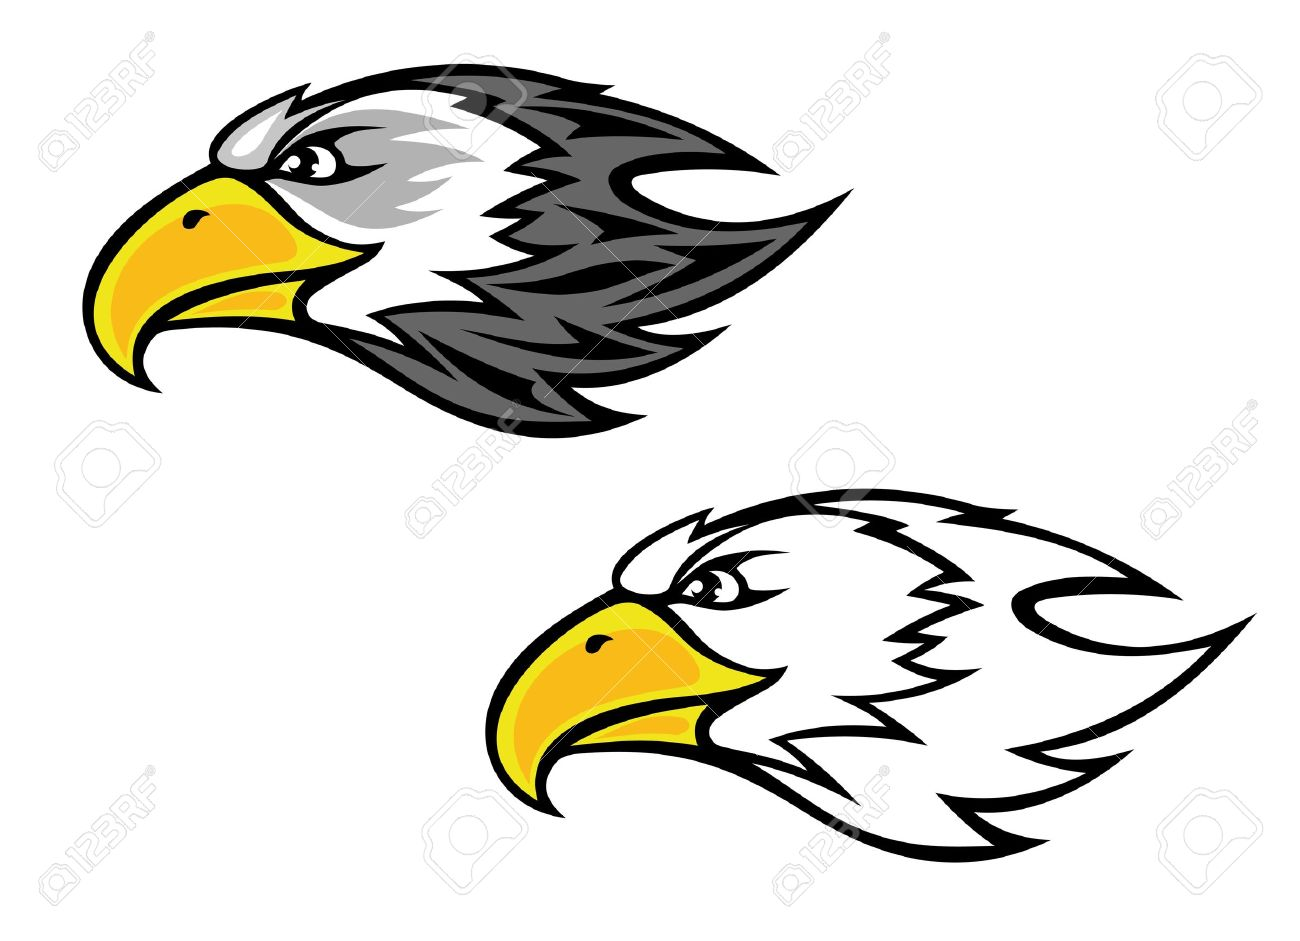 24,652 Hawk Stock Vector Illustration And Royalty Free Hawk Clipart